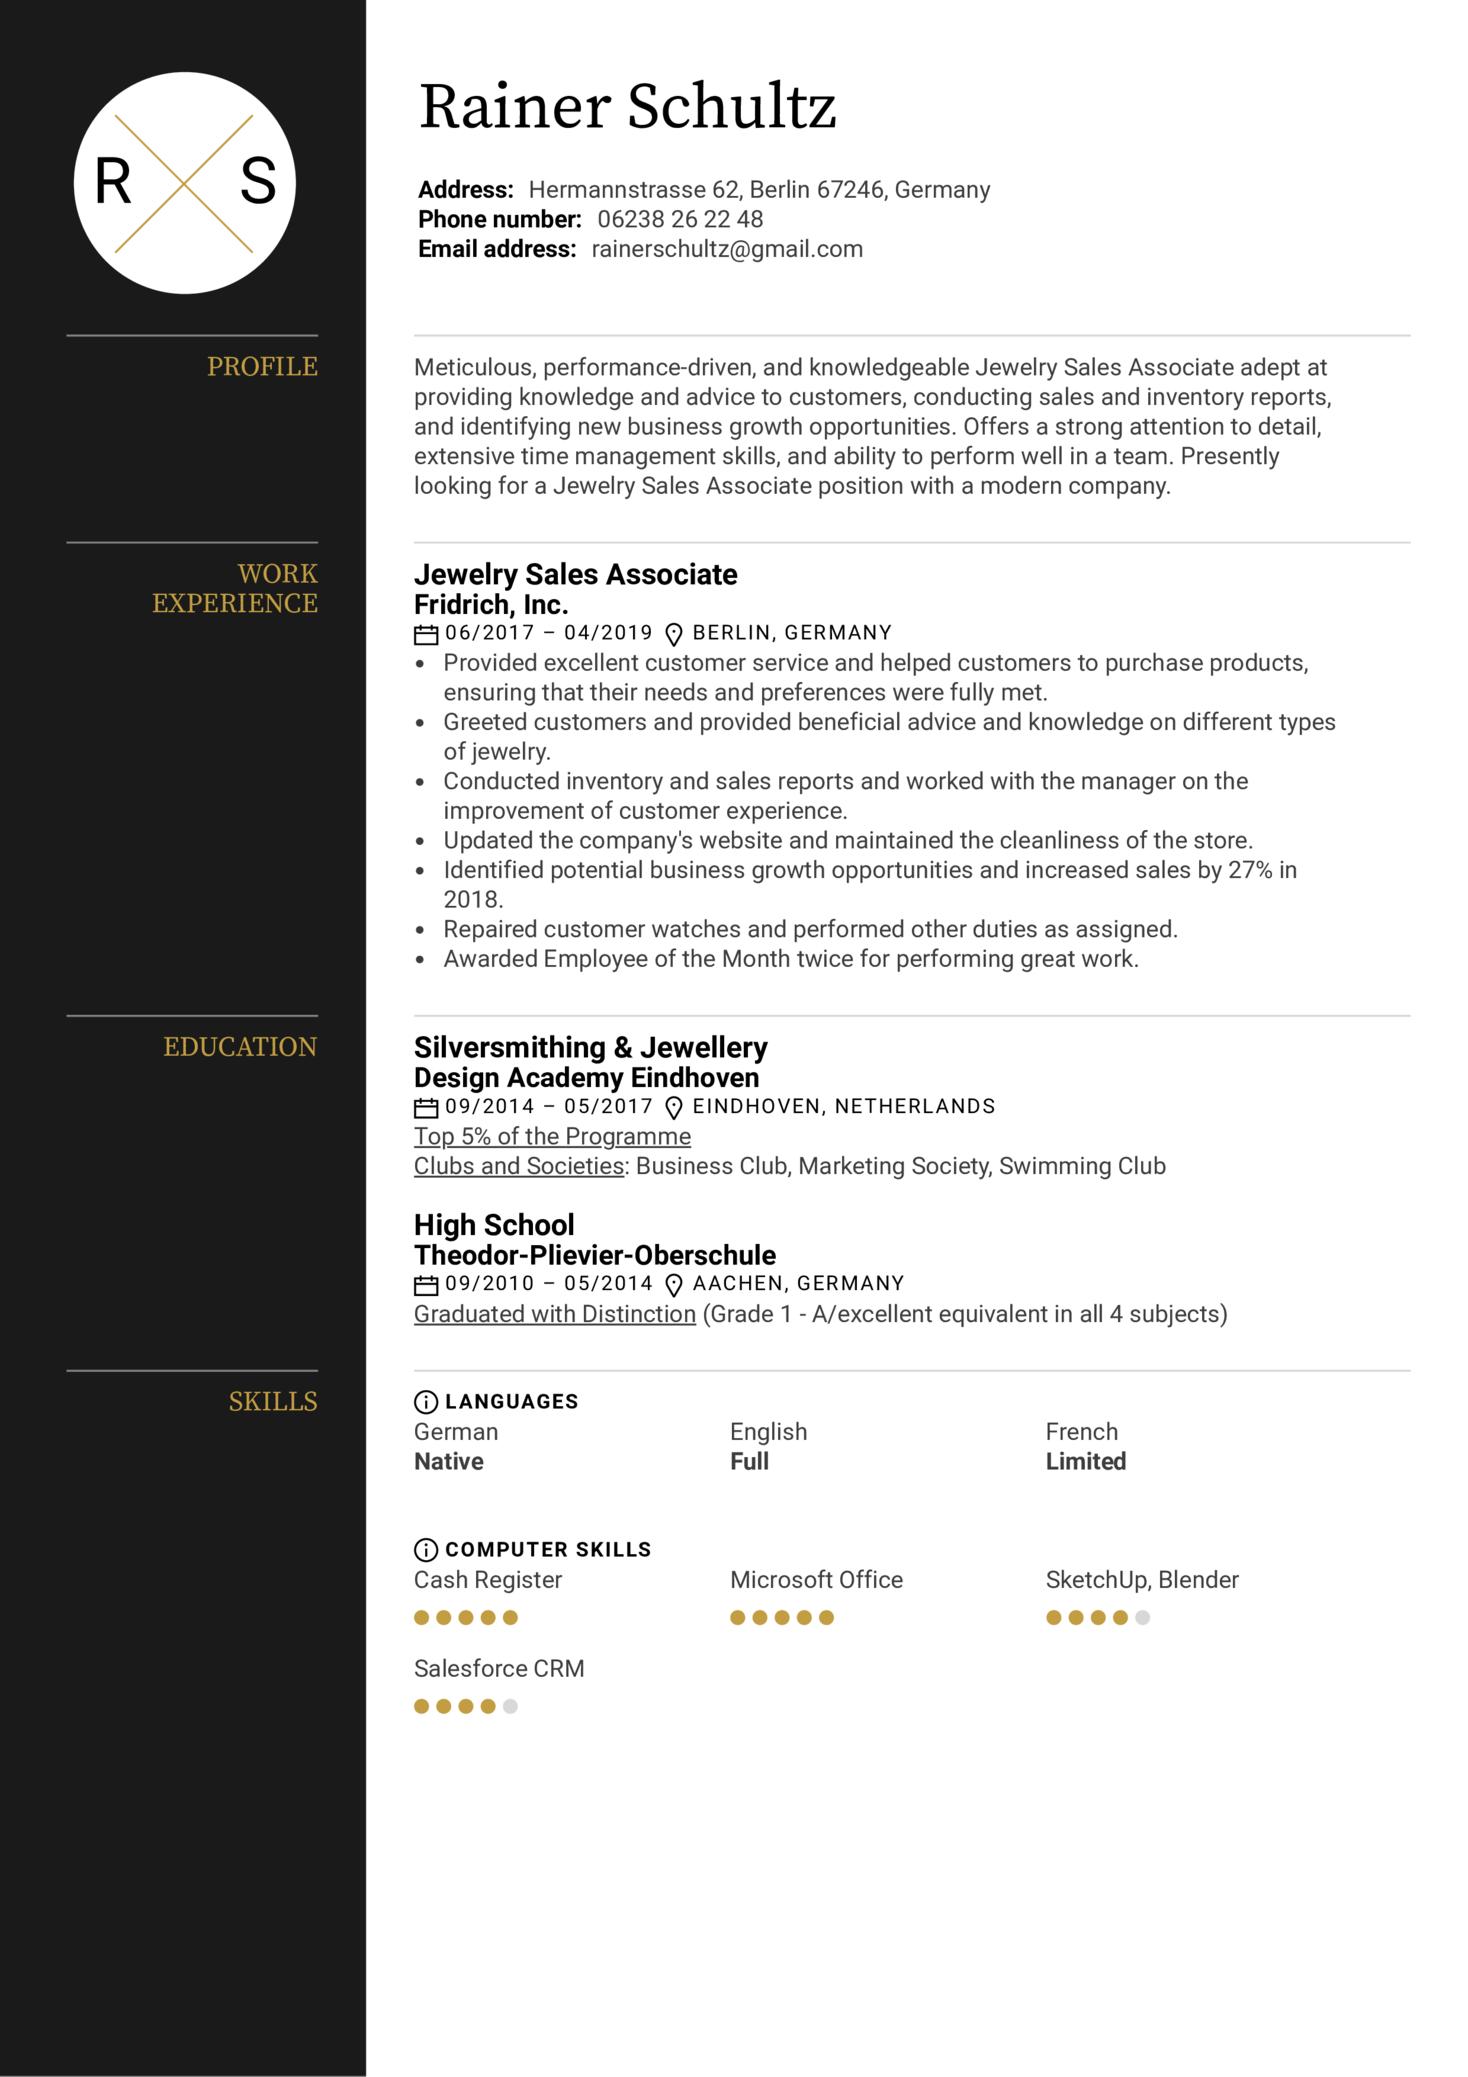 Jewelry Sales Associate Resume Sample (Part 1)